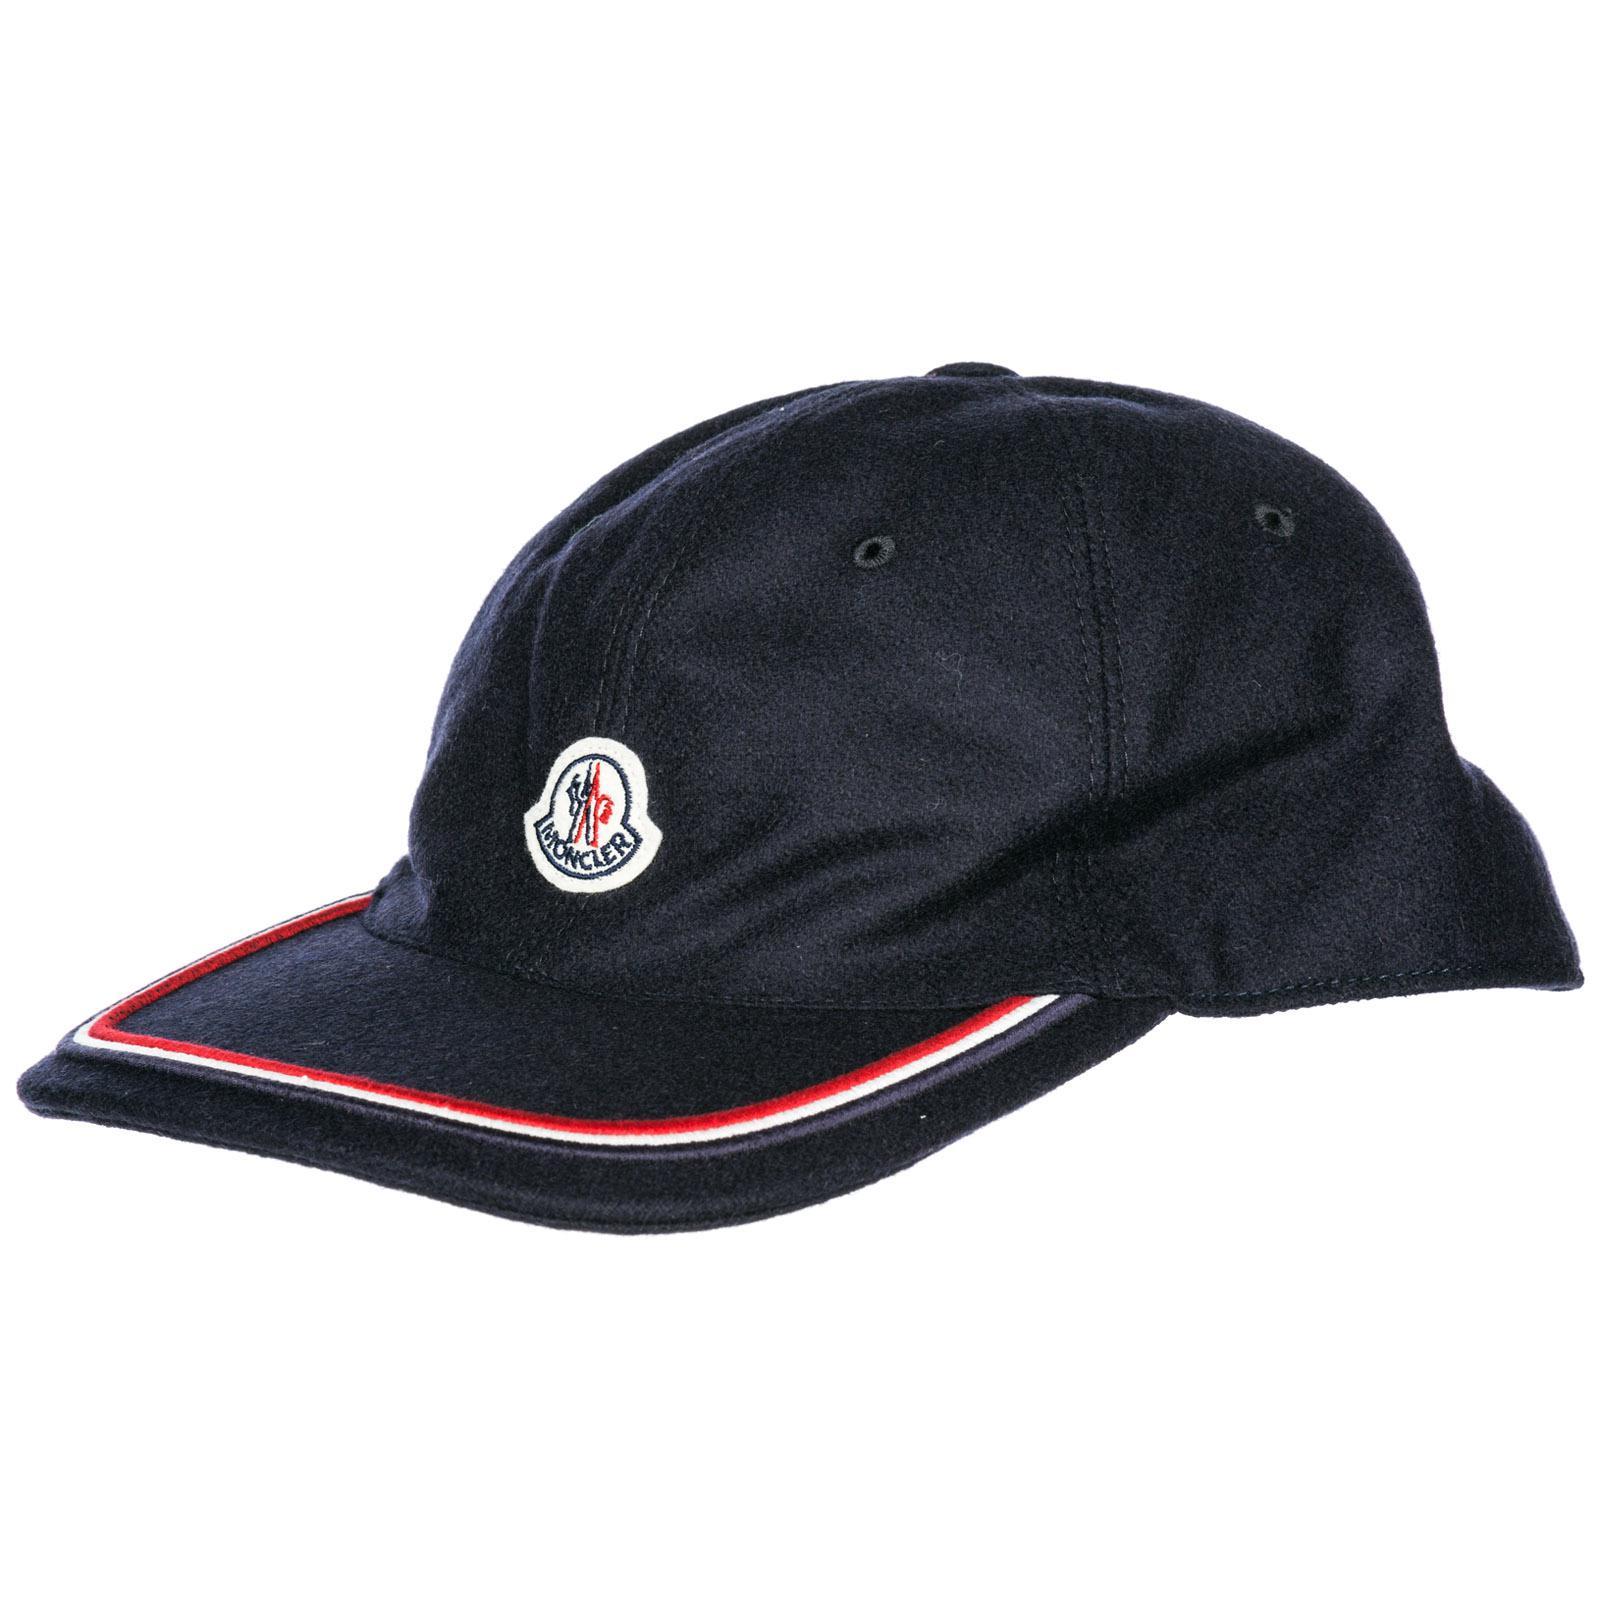 8a40f6b5089 Lyst - Moncler Adjustable Cotton Hat Baseball Cap in Blue for Men ...